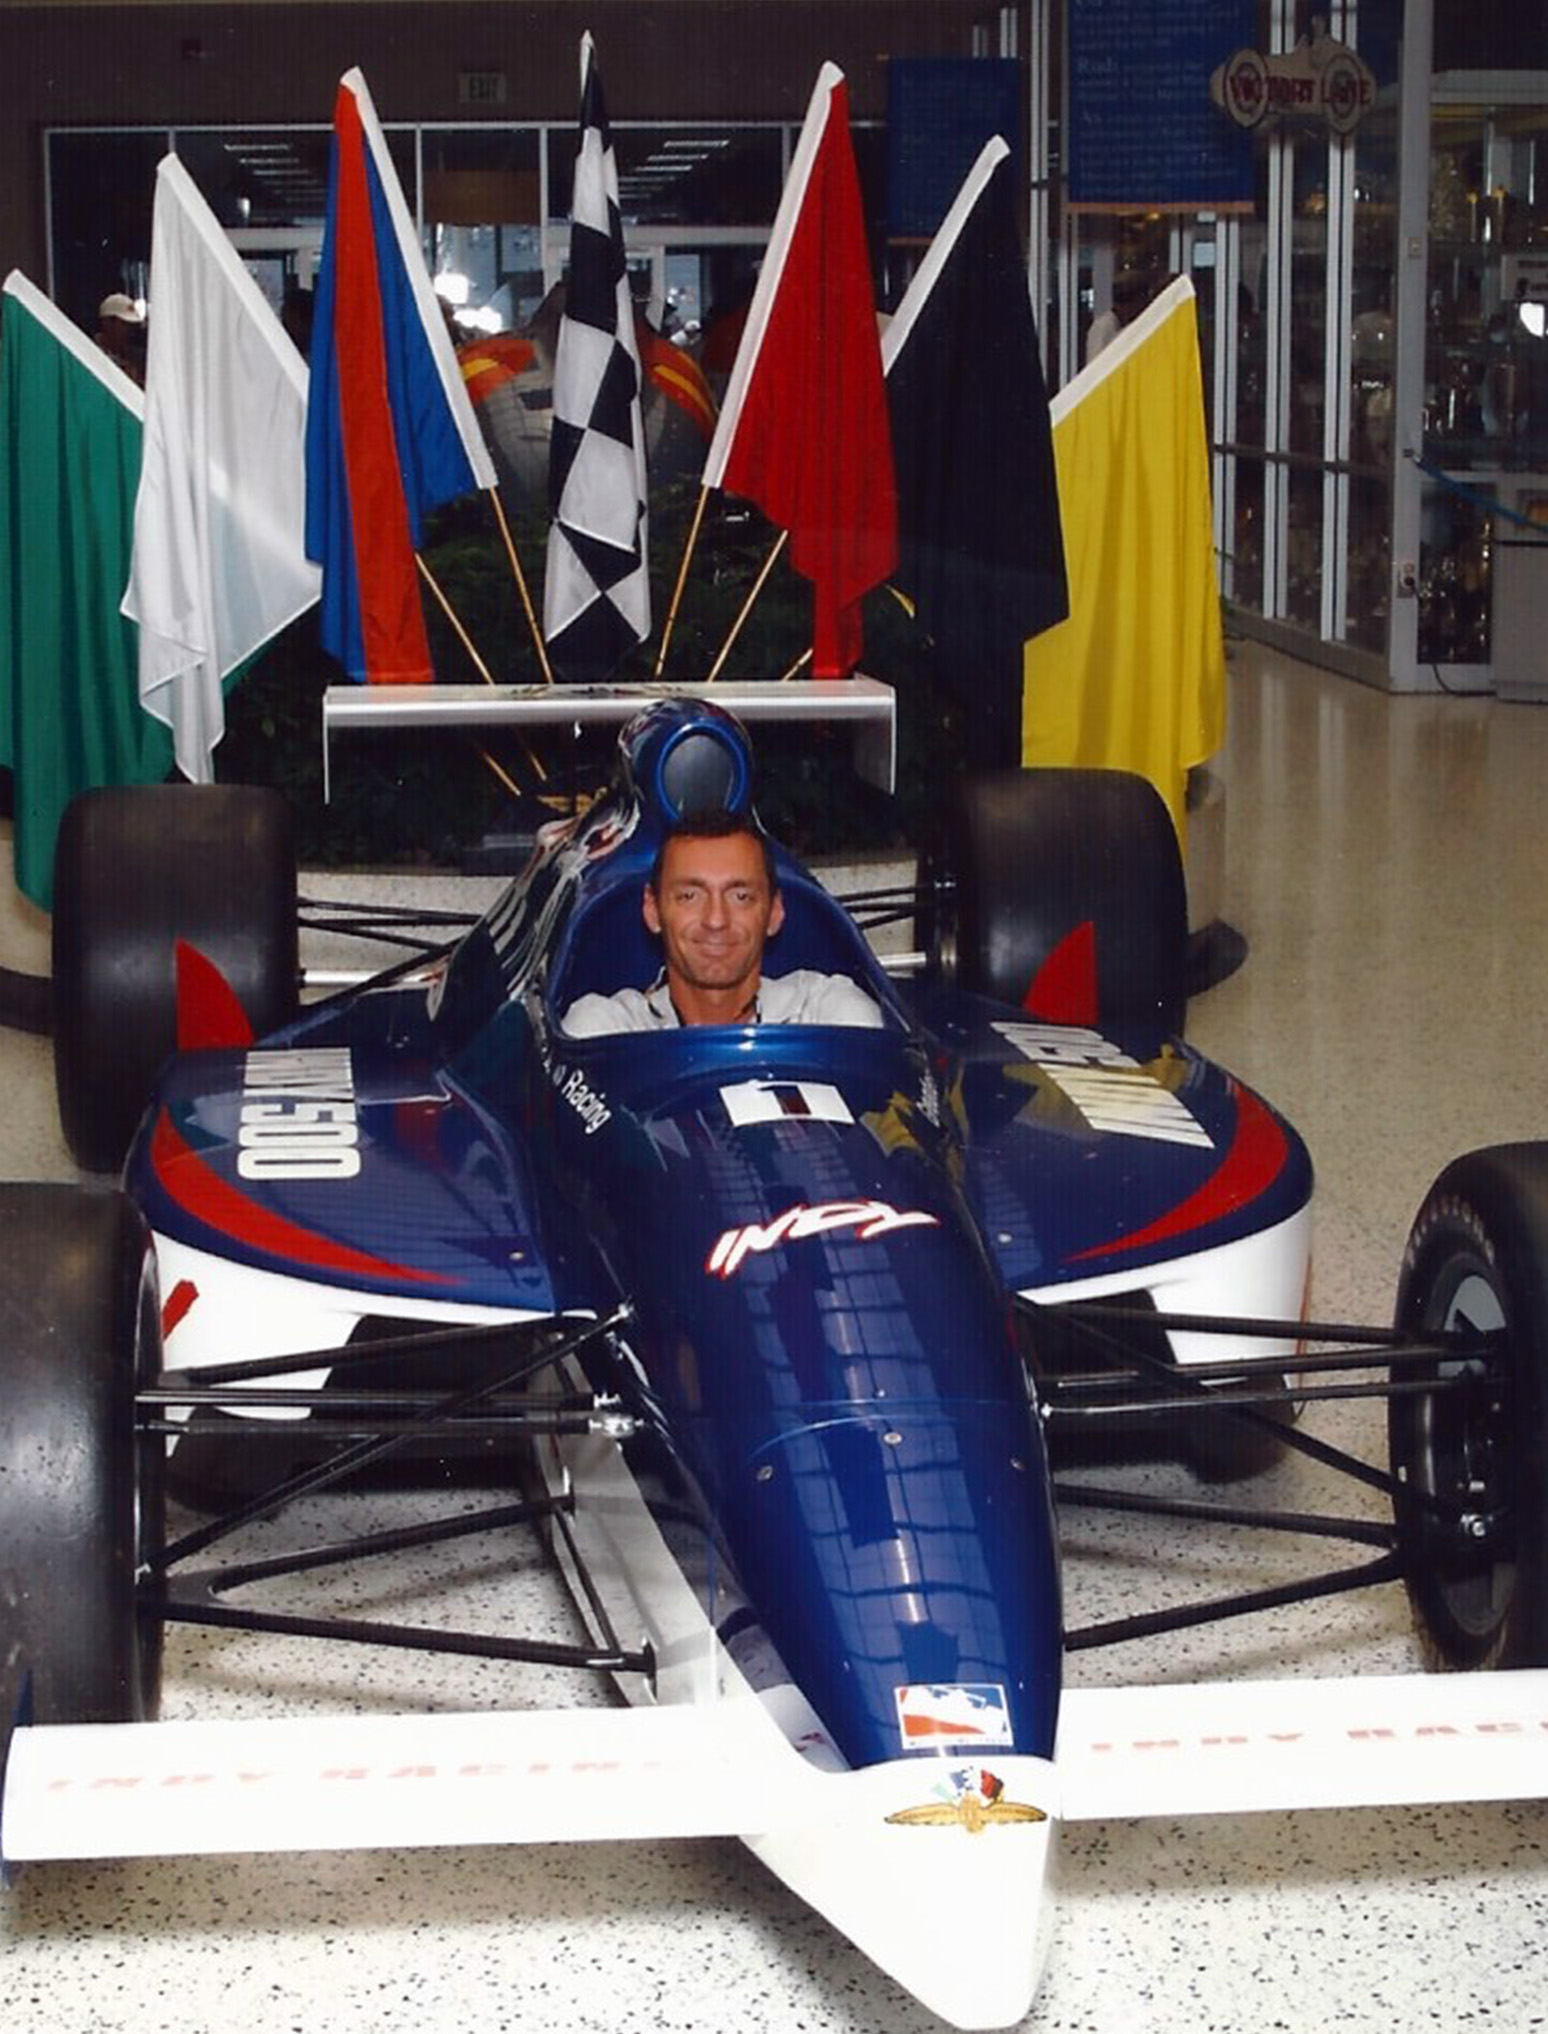 indy-car-museum-1b